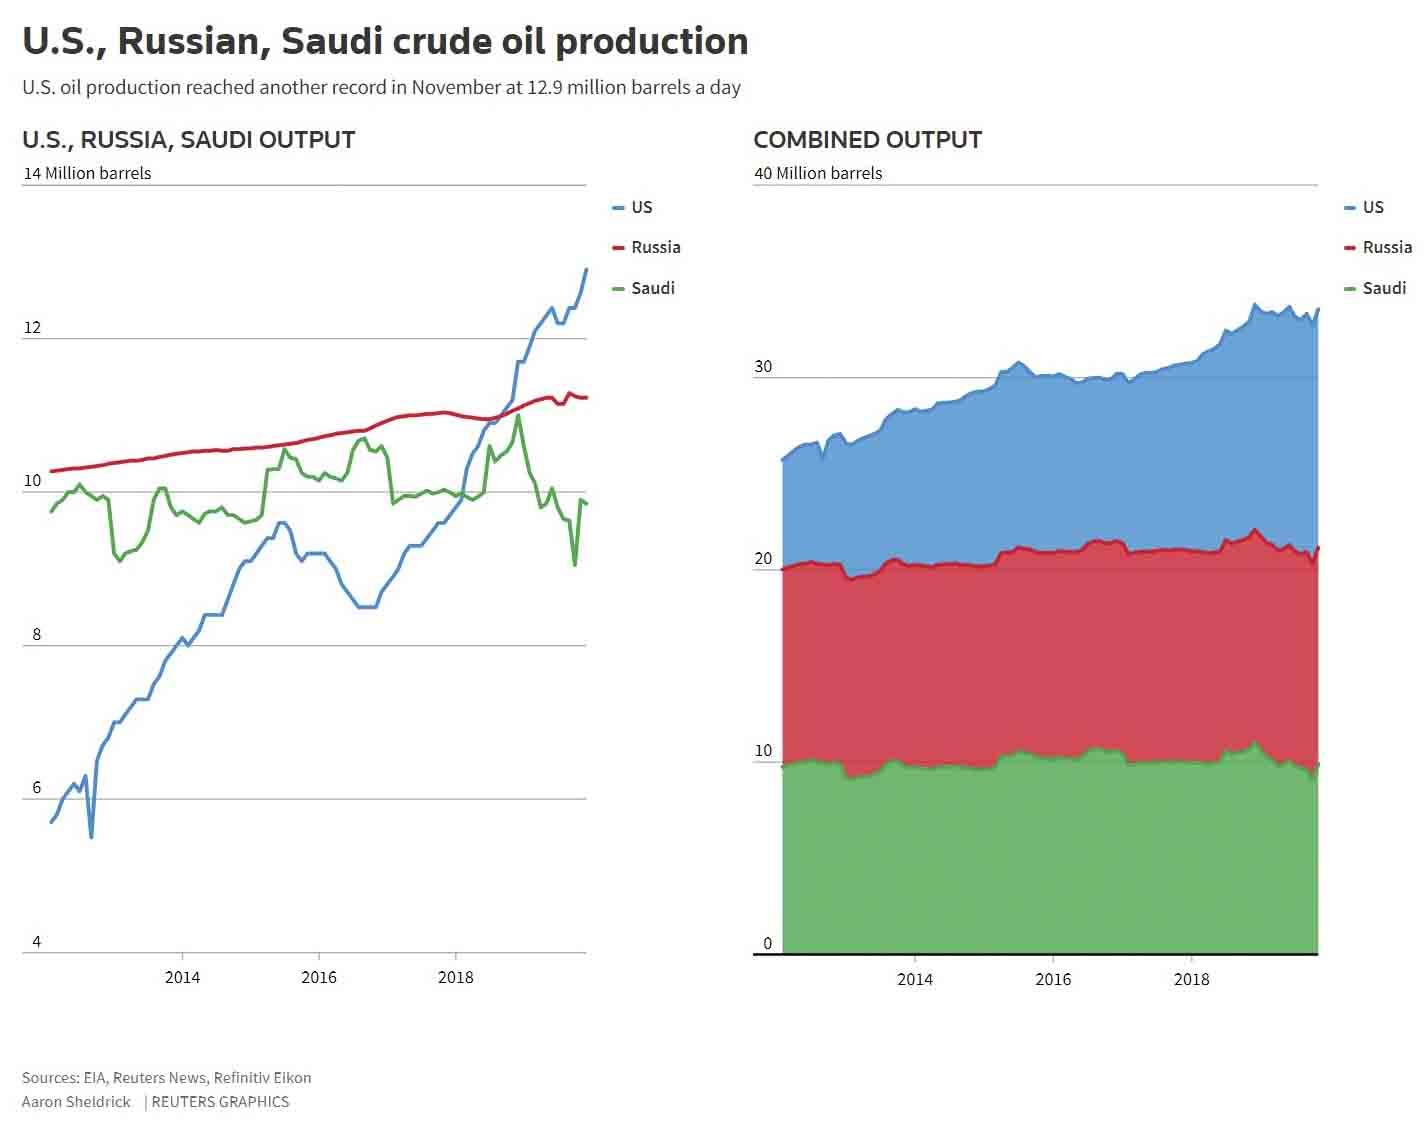 U.S., Russian and Saudi crude oil production